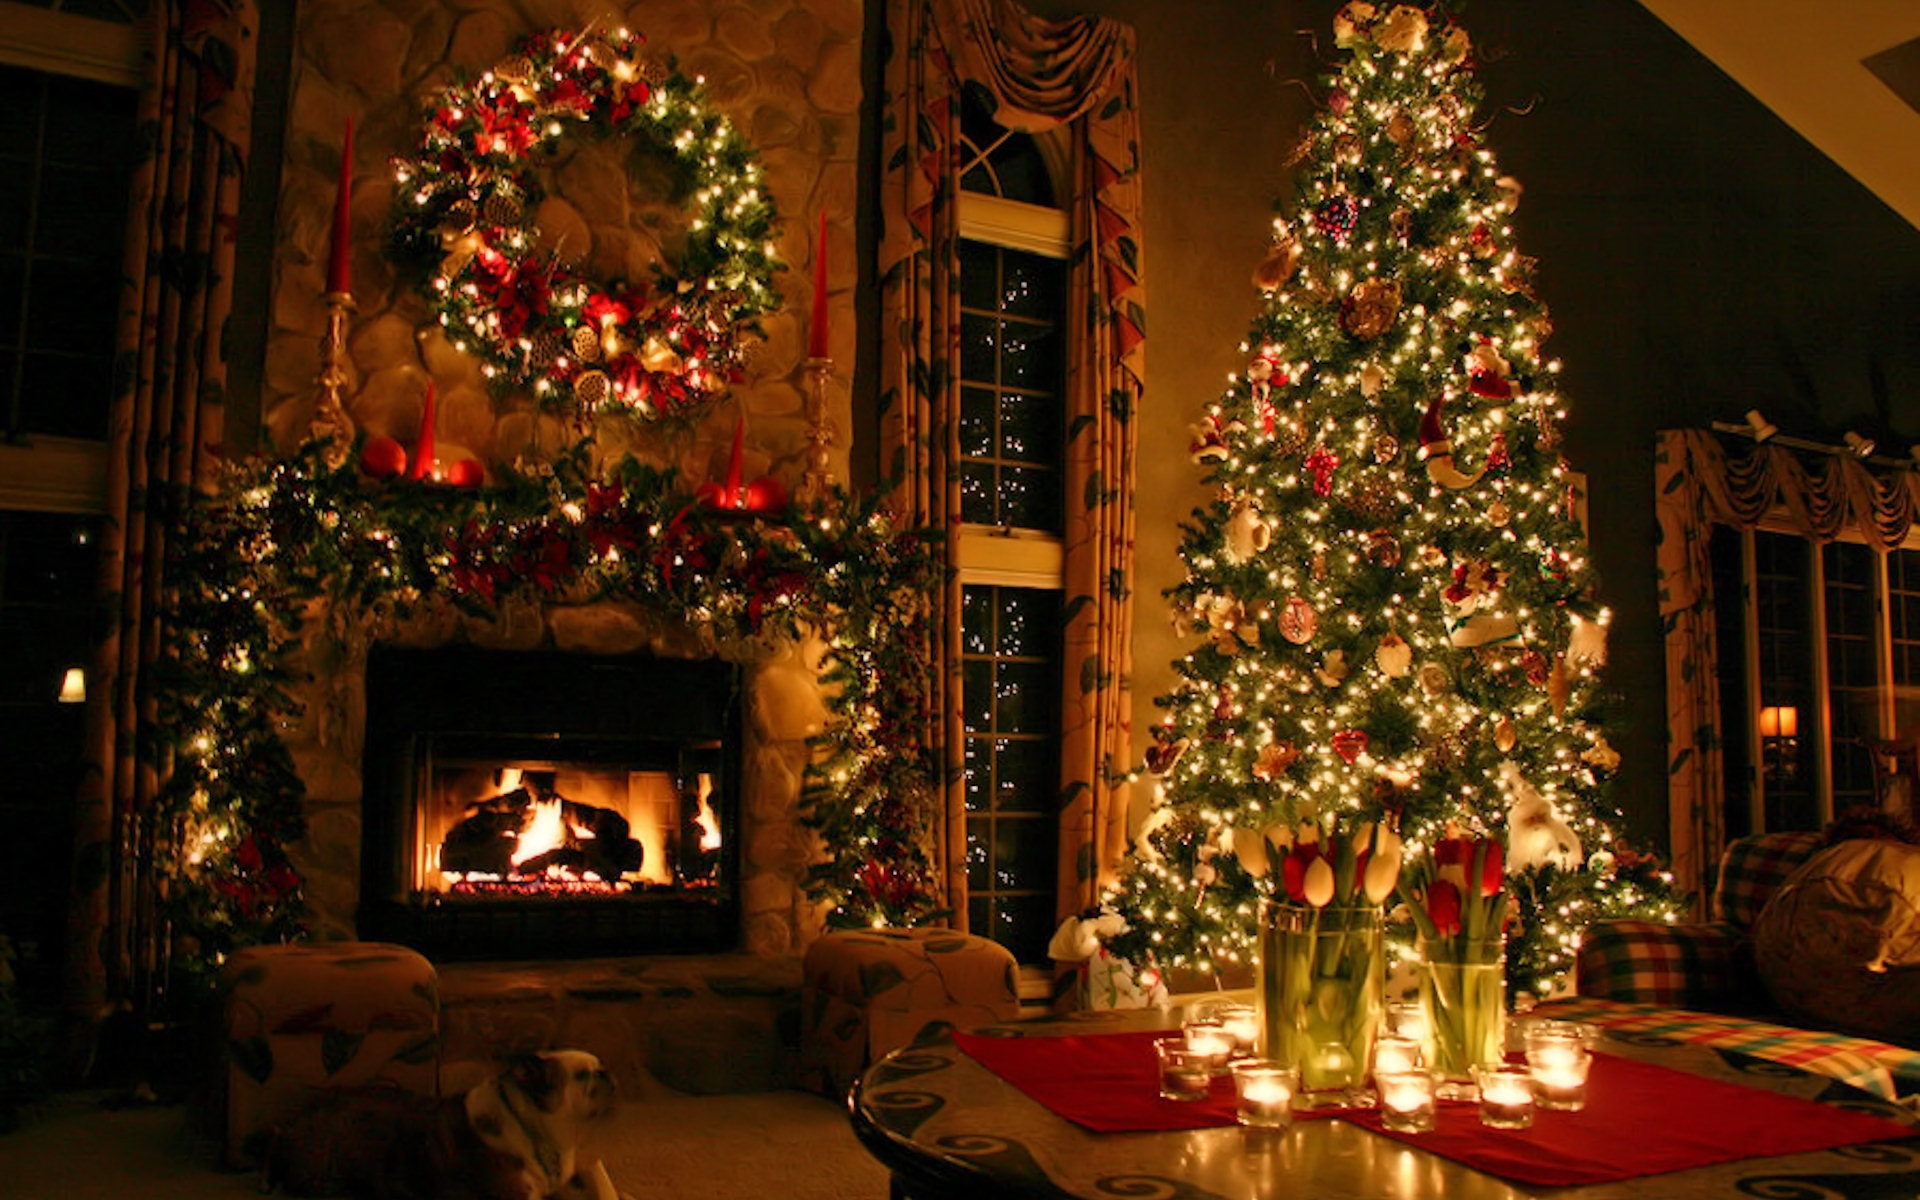 21 Stunningly Beautiful Christmas Desktop Wallpapers   Website 1920x1200